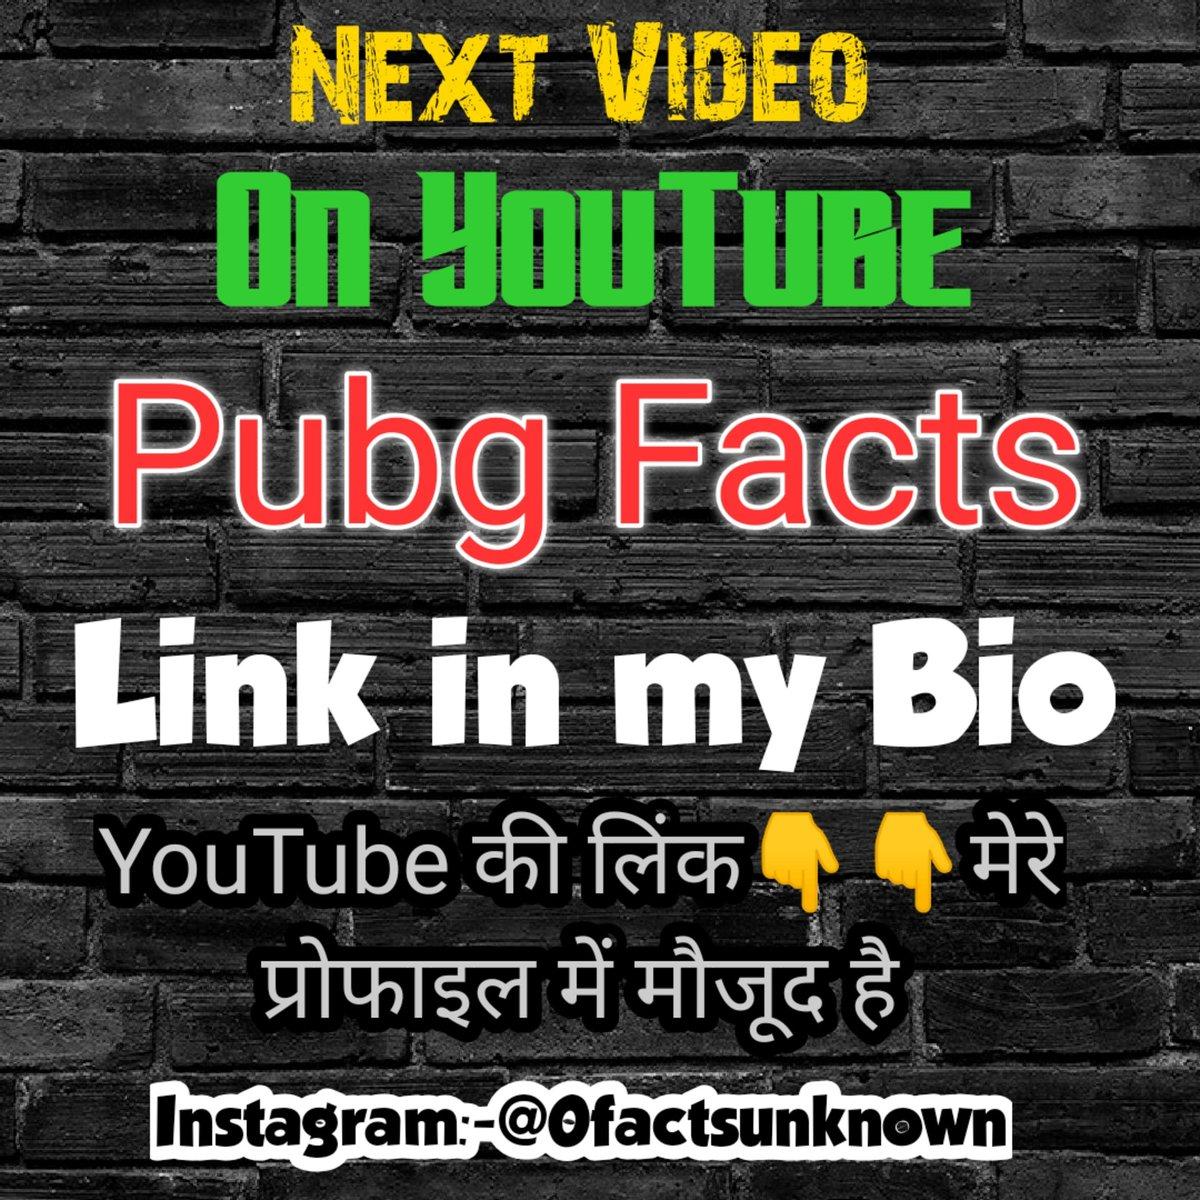 Follow me guys @FactsUnknown2 Subscribe my youtube channel #FACTSUNKNOWN  #Factsinhindi #factsnews  #factshumans  #factsinhindi  #factshindi  #facts  #followforfollowback  #factstechz  #Facttechz  #rochaktathya #rochaktathyainhindi #rochaknews #rochak #amazingfactsandgkinhindipic.twitter.com/vaS3PGudJB